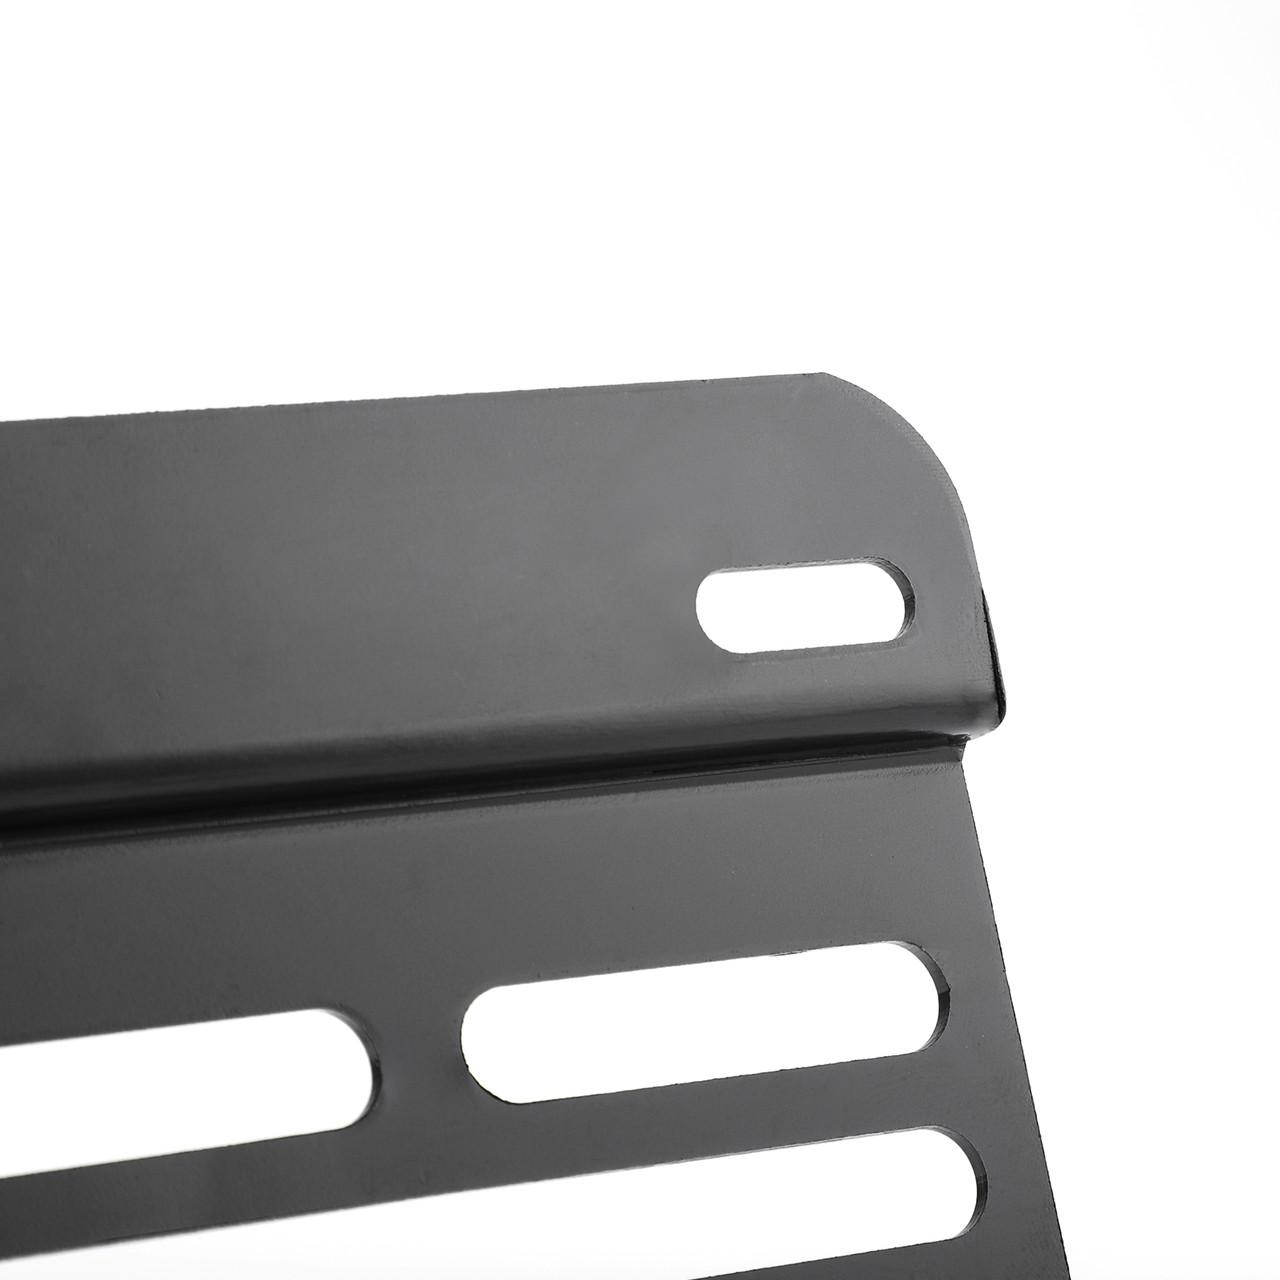 Front Bumper Tow Hook License Plate Mounting Holder Bracket For Volkswagen MK6 Jetta Sportwagon 10-14 Black